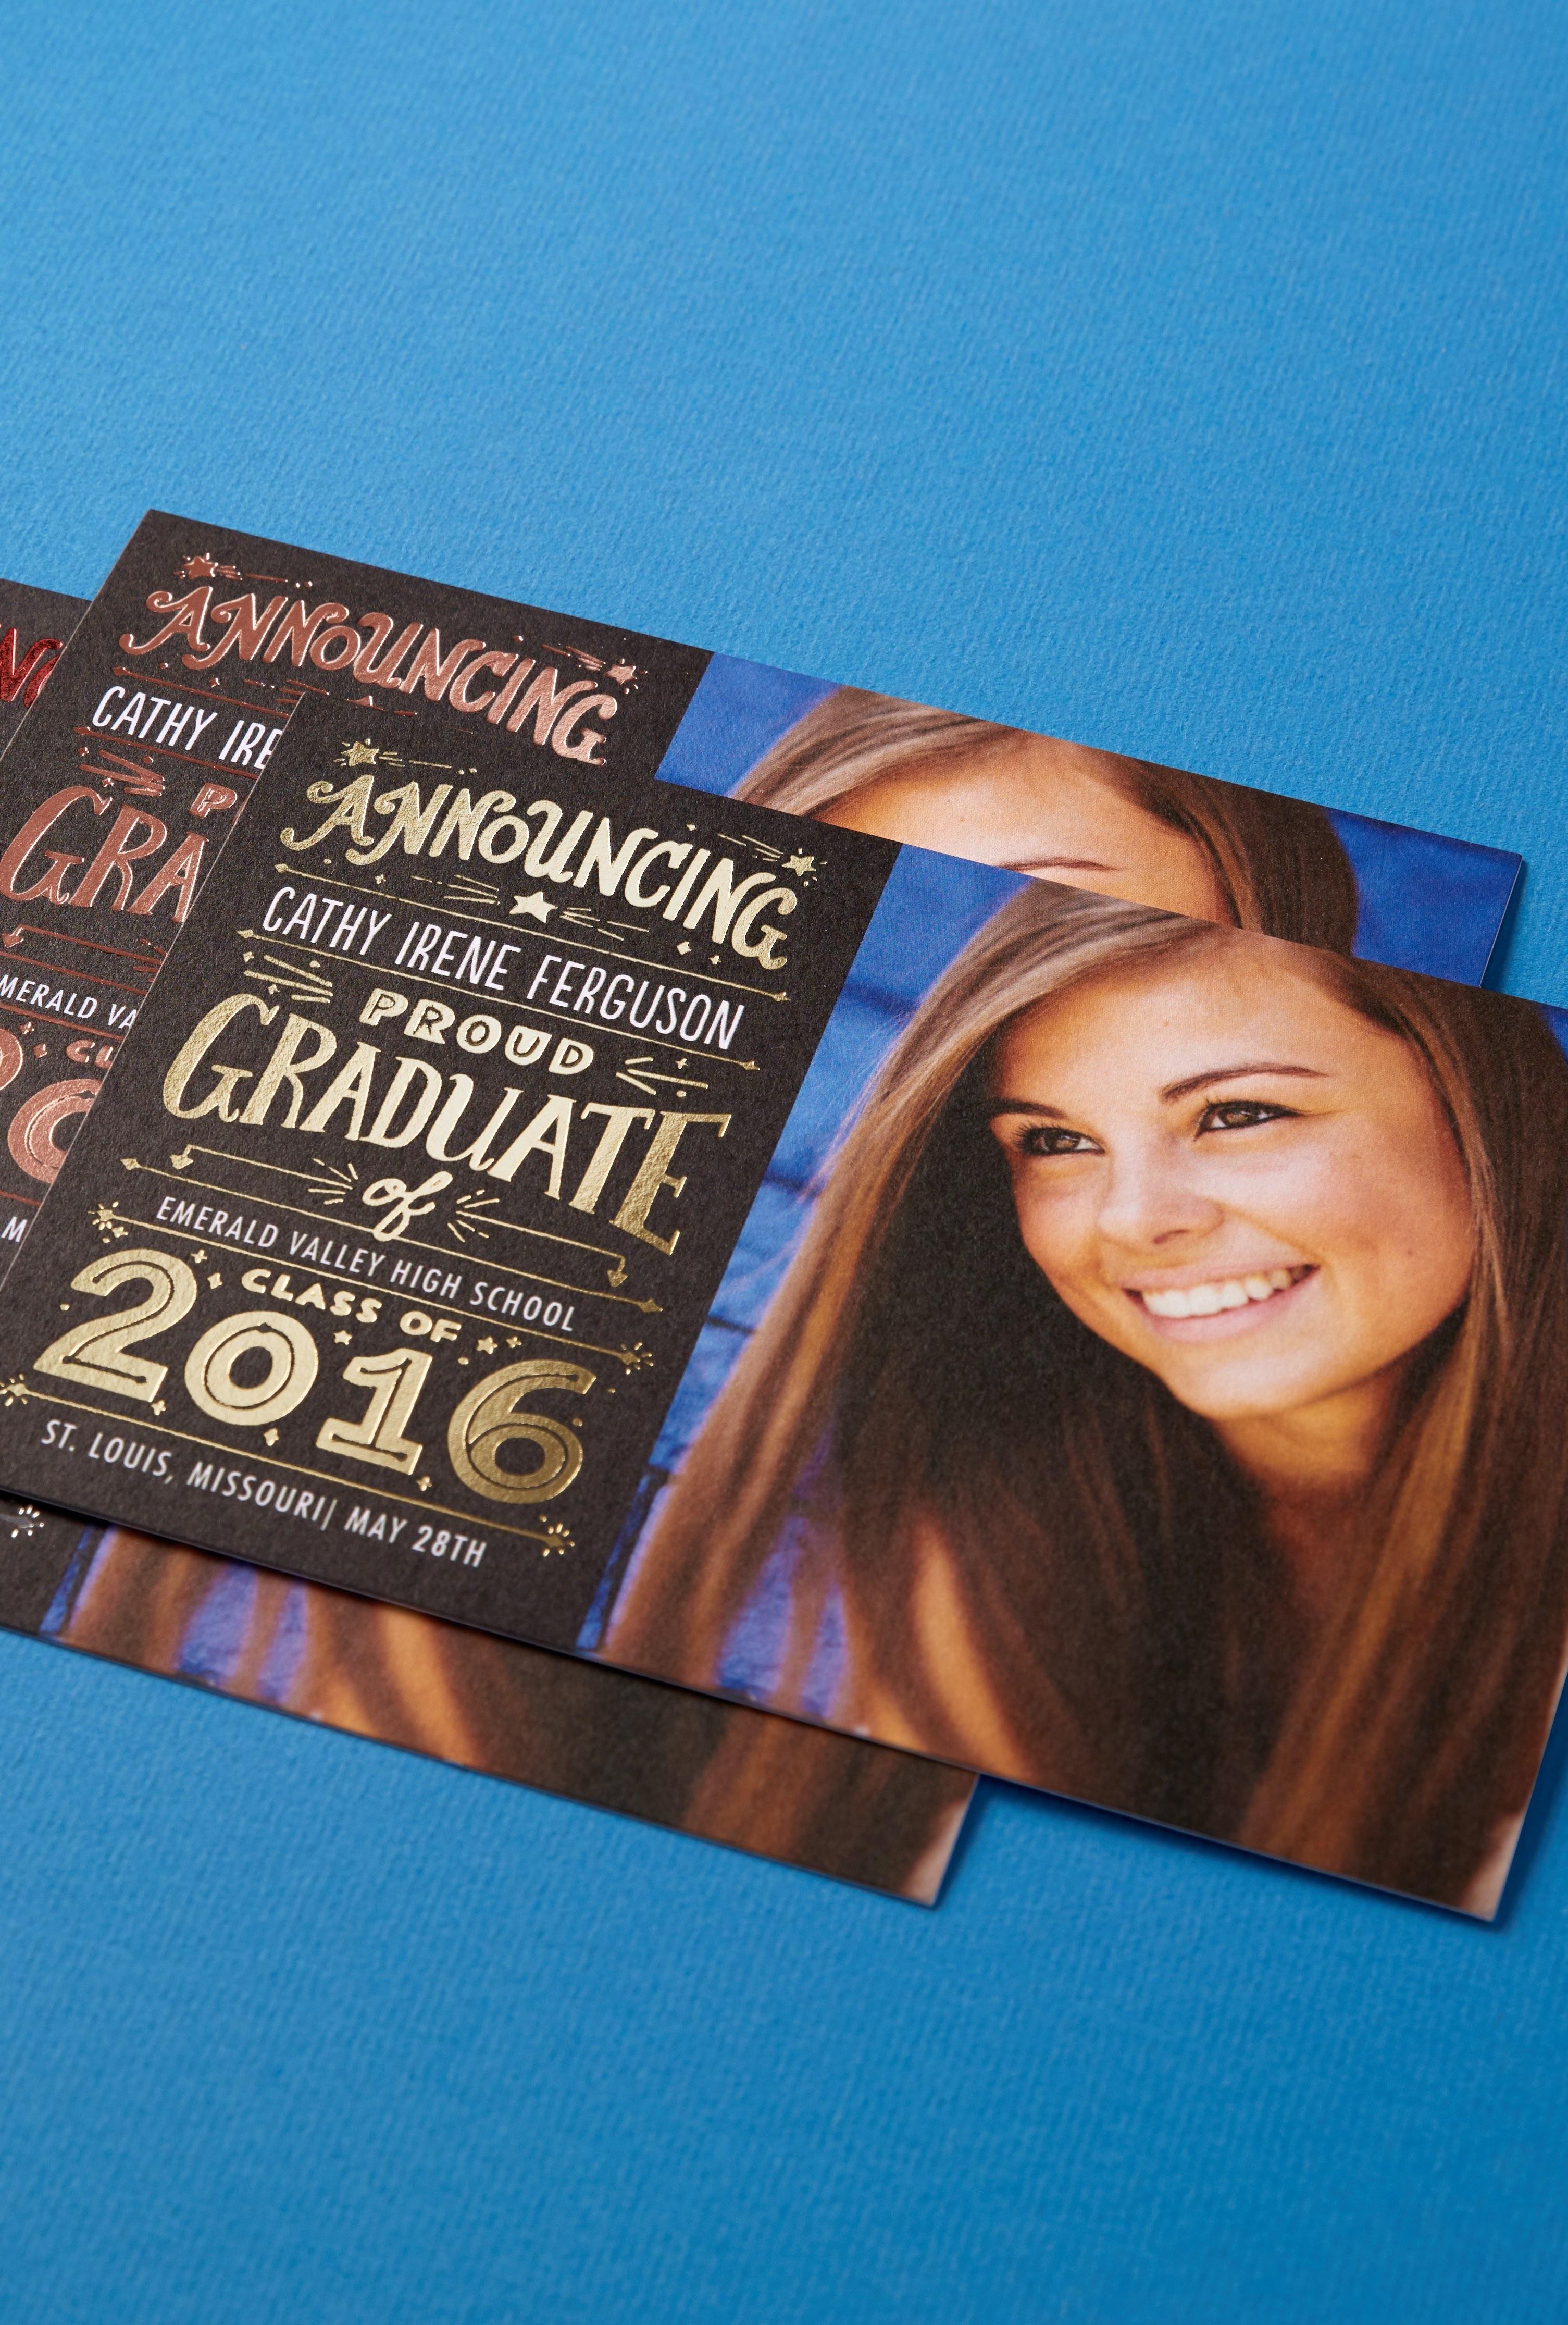 Victorious Win Foil Stamped Graduation Announcements